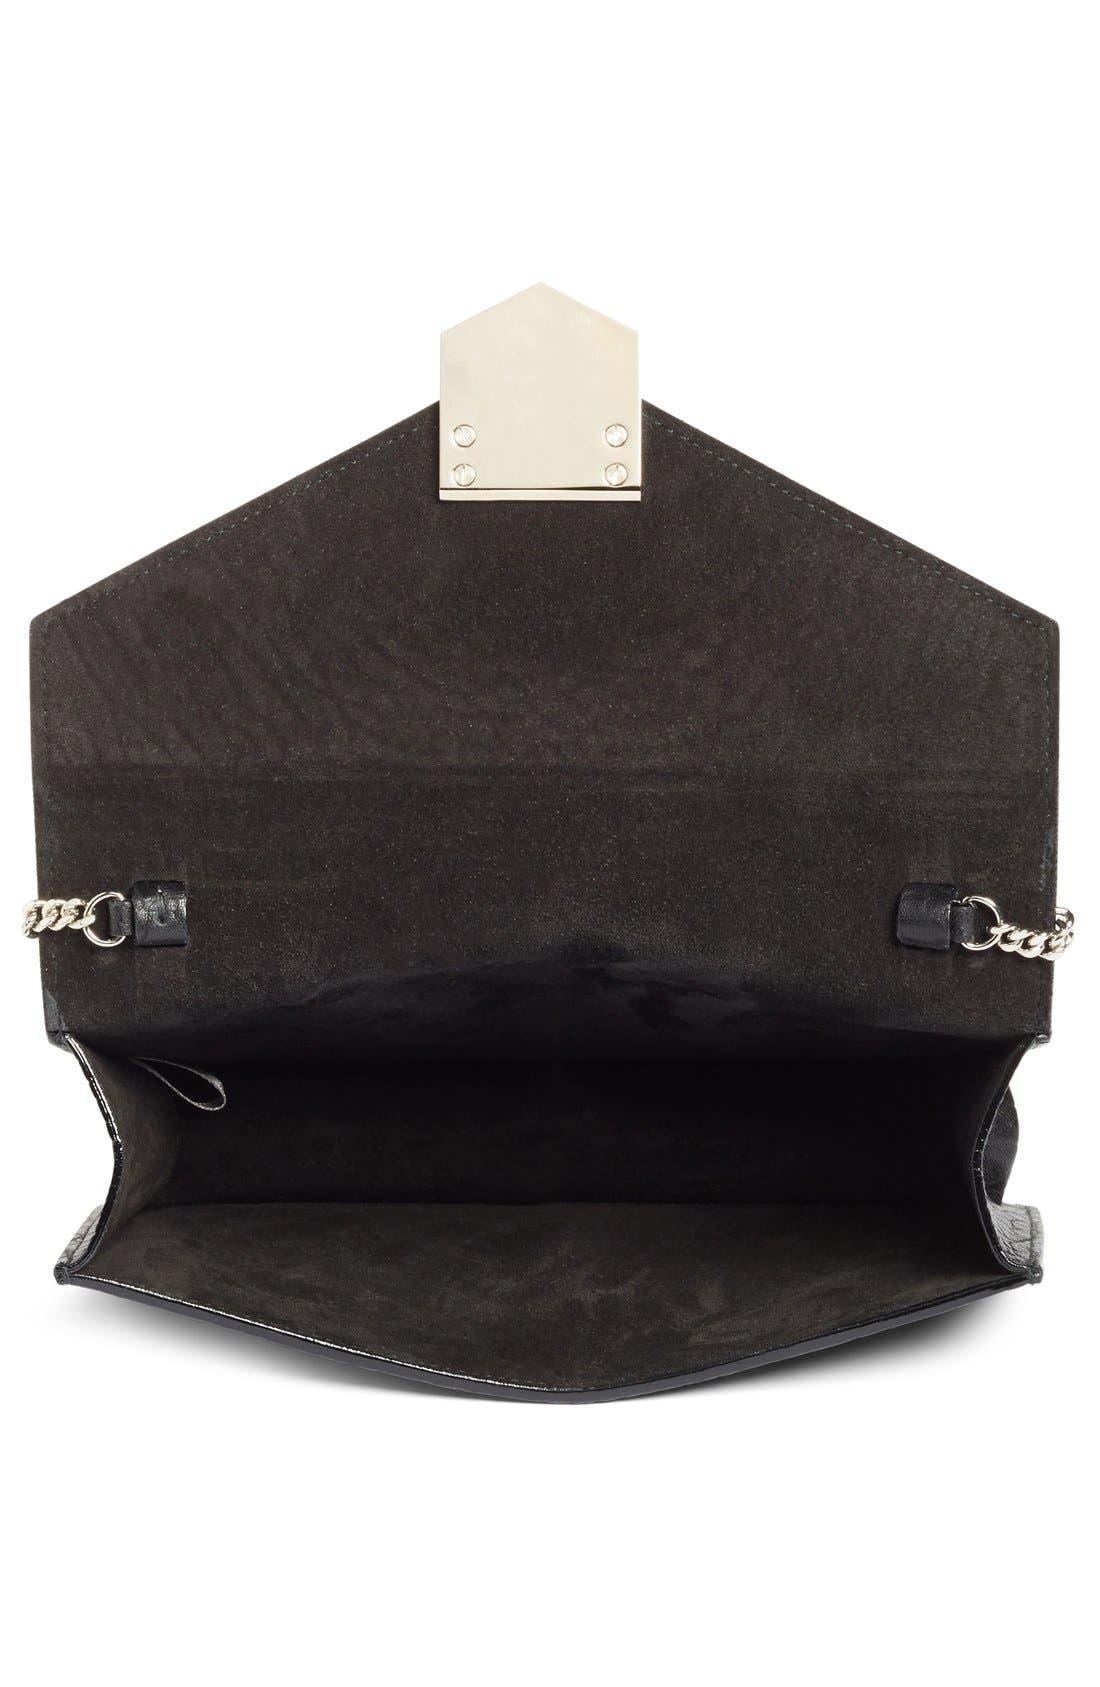 Leila Grainy Lambskin Leather Crossbody Bag,                             Alternate thumbnail 6, color,                             001